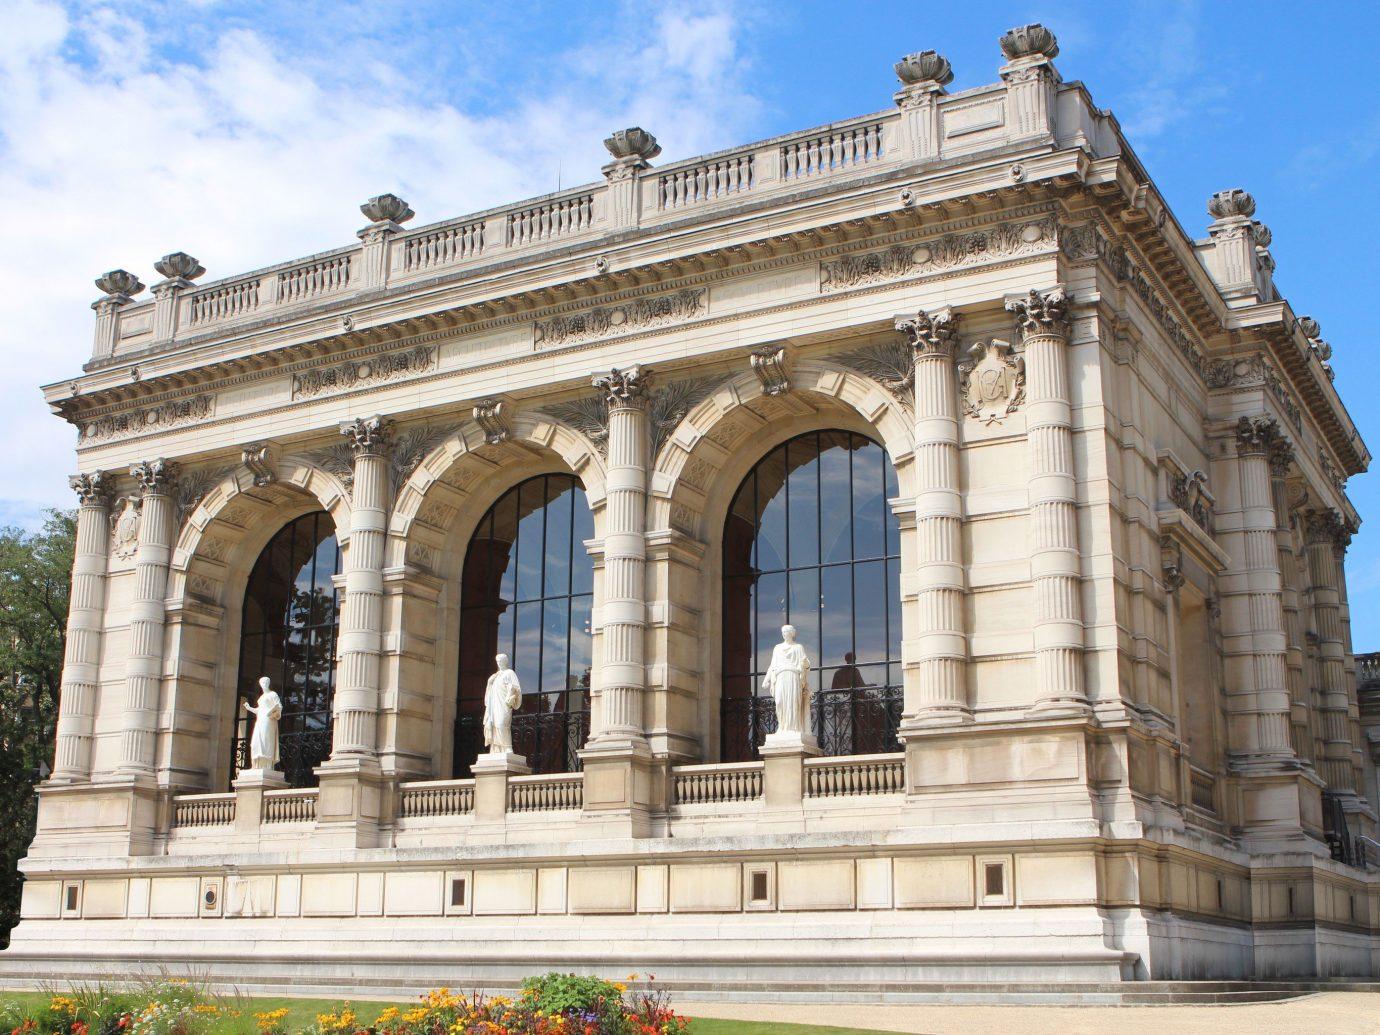 Exterior view of Palais Galliera in Paris